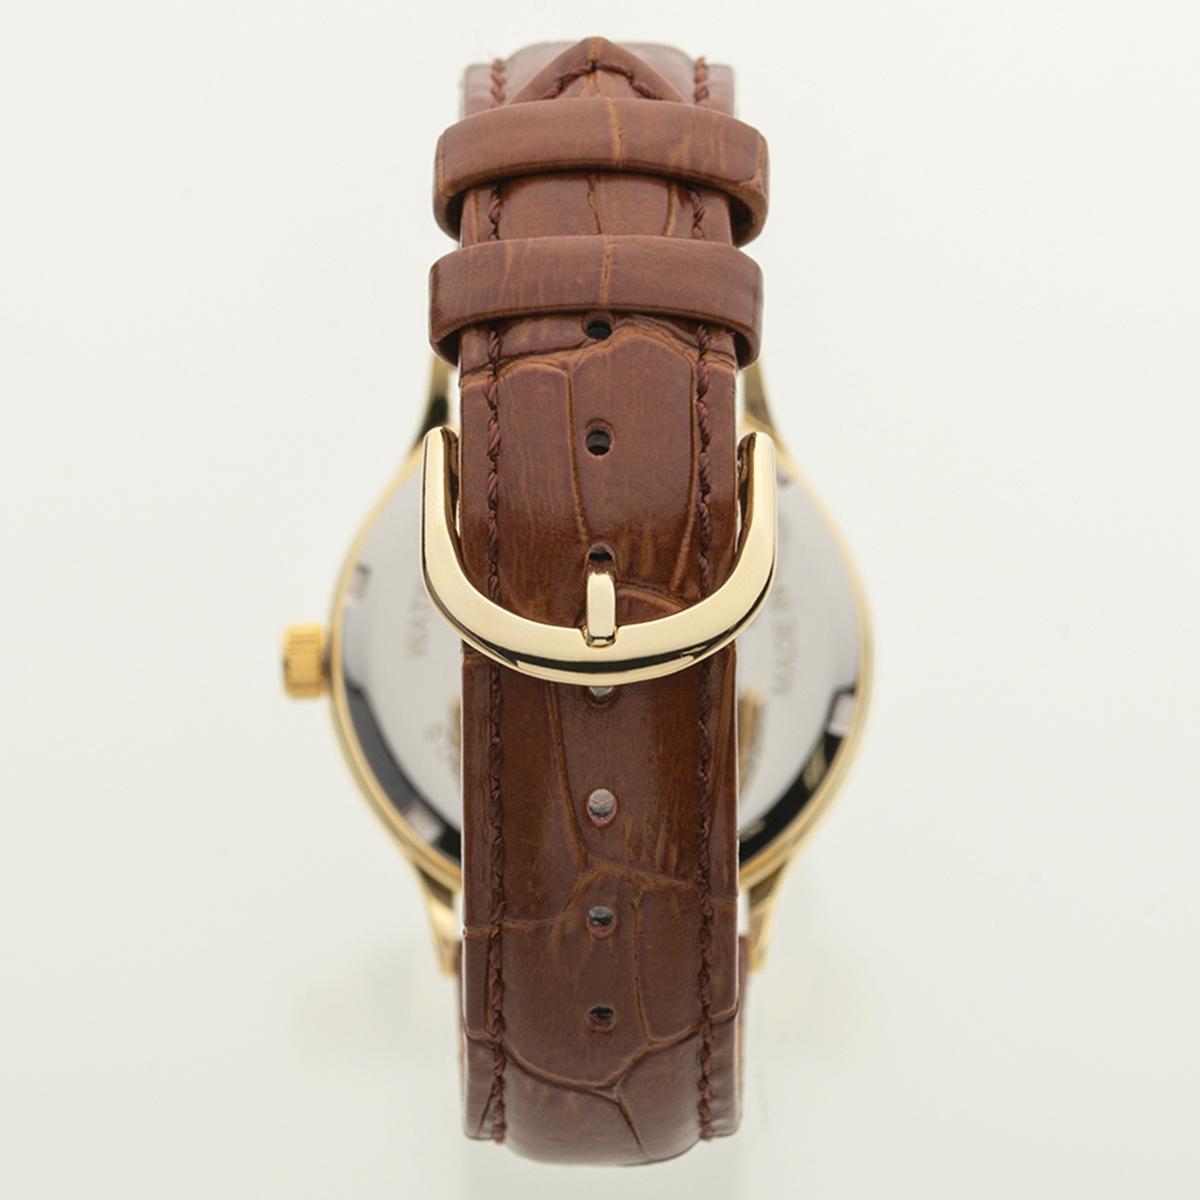 AVANTINO アヴァンティーノ 腕時計 アナログウオッチ 本革 メンズ【AV-AM172】